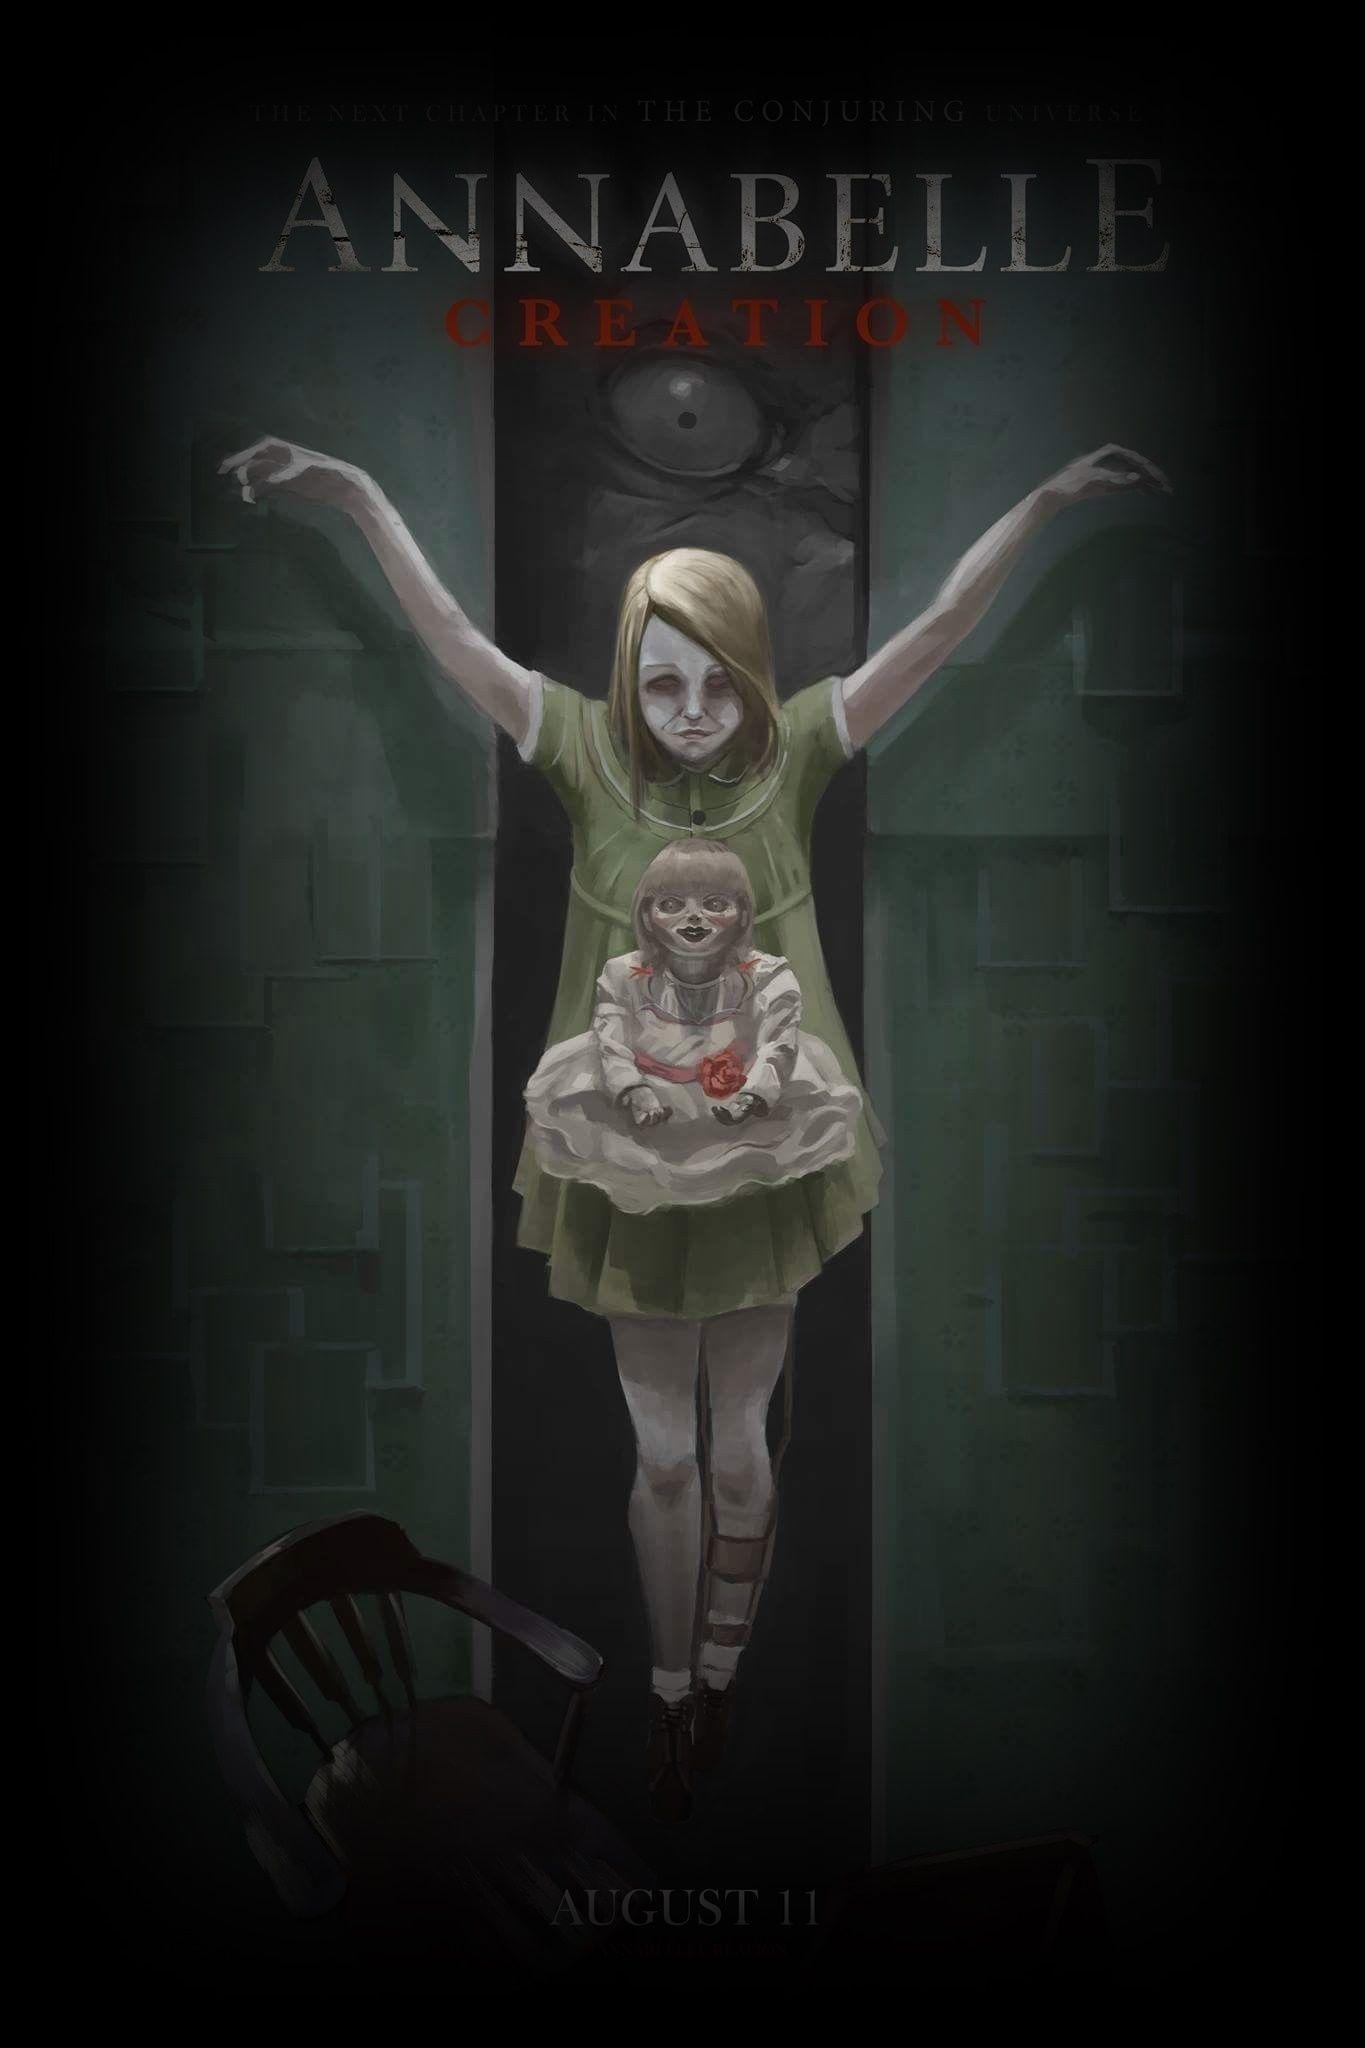 Annabelle 1 En Francais Complet : annabelle, francais, complet, Film›Magyarul〛-, ANNABELLE, Teljes, Online'HD, Horror, Movie, Posters,